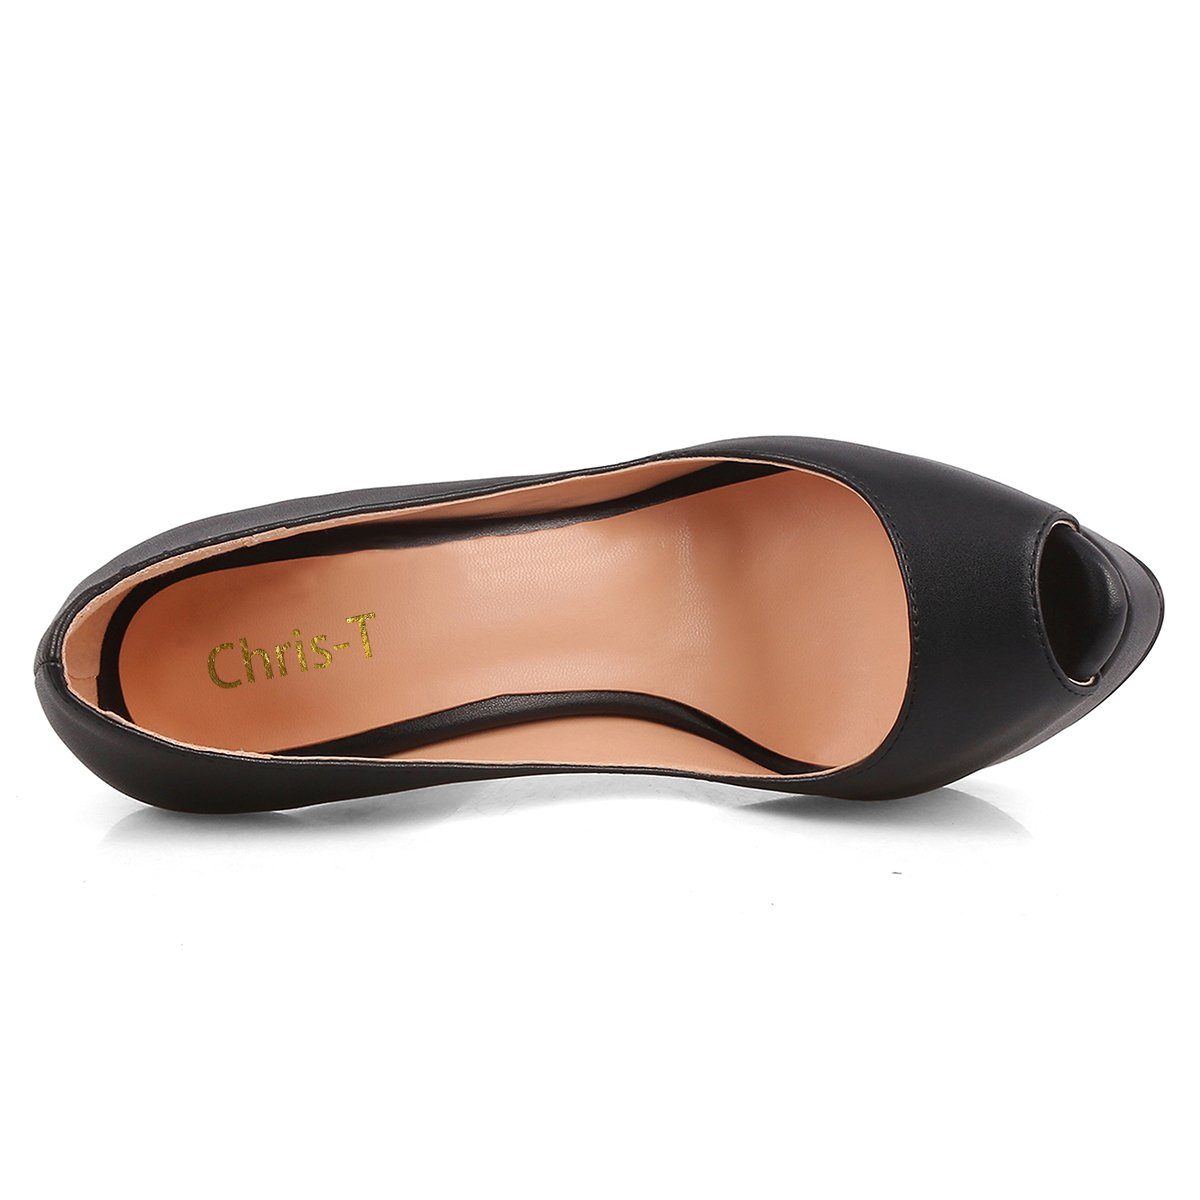 Chris-T Damen Slip on High Heels Peep Toe Stiletto Plattform Pumps Pumps Plattform Größe 35-45 Schwarz-matt/R0te Sohle 795be1